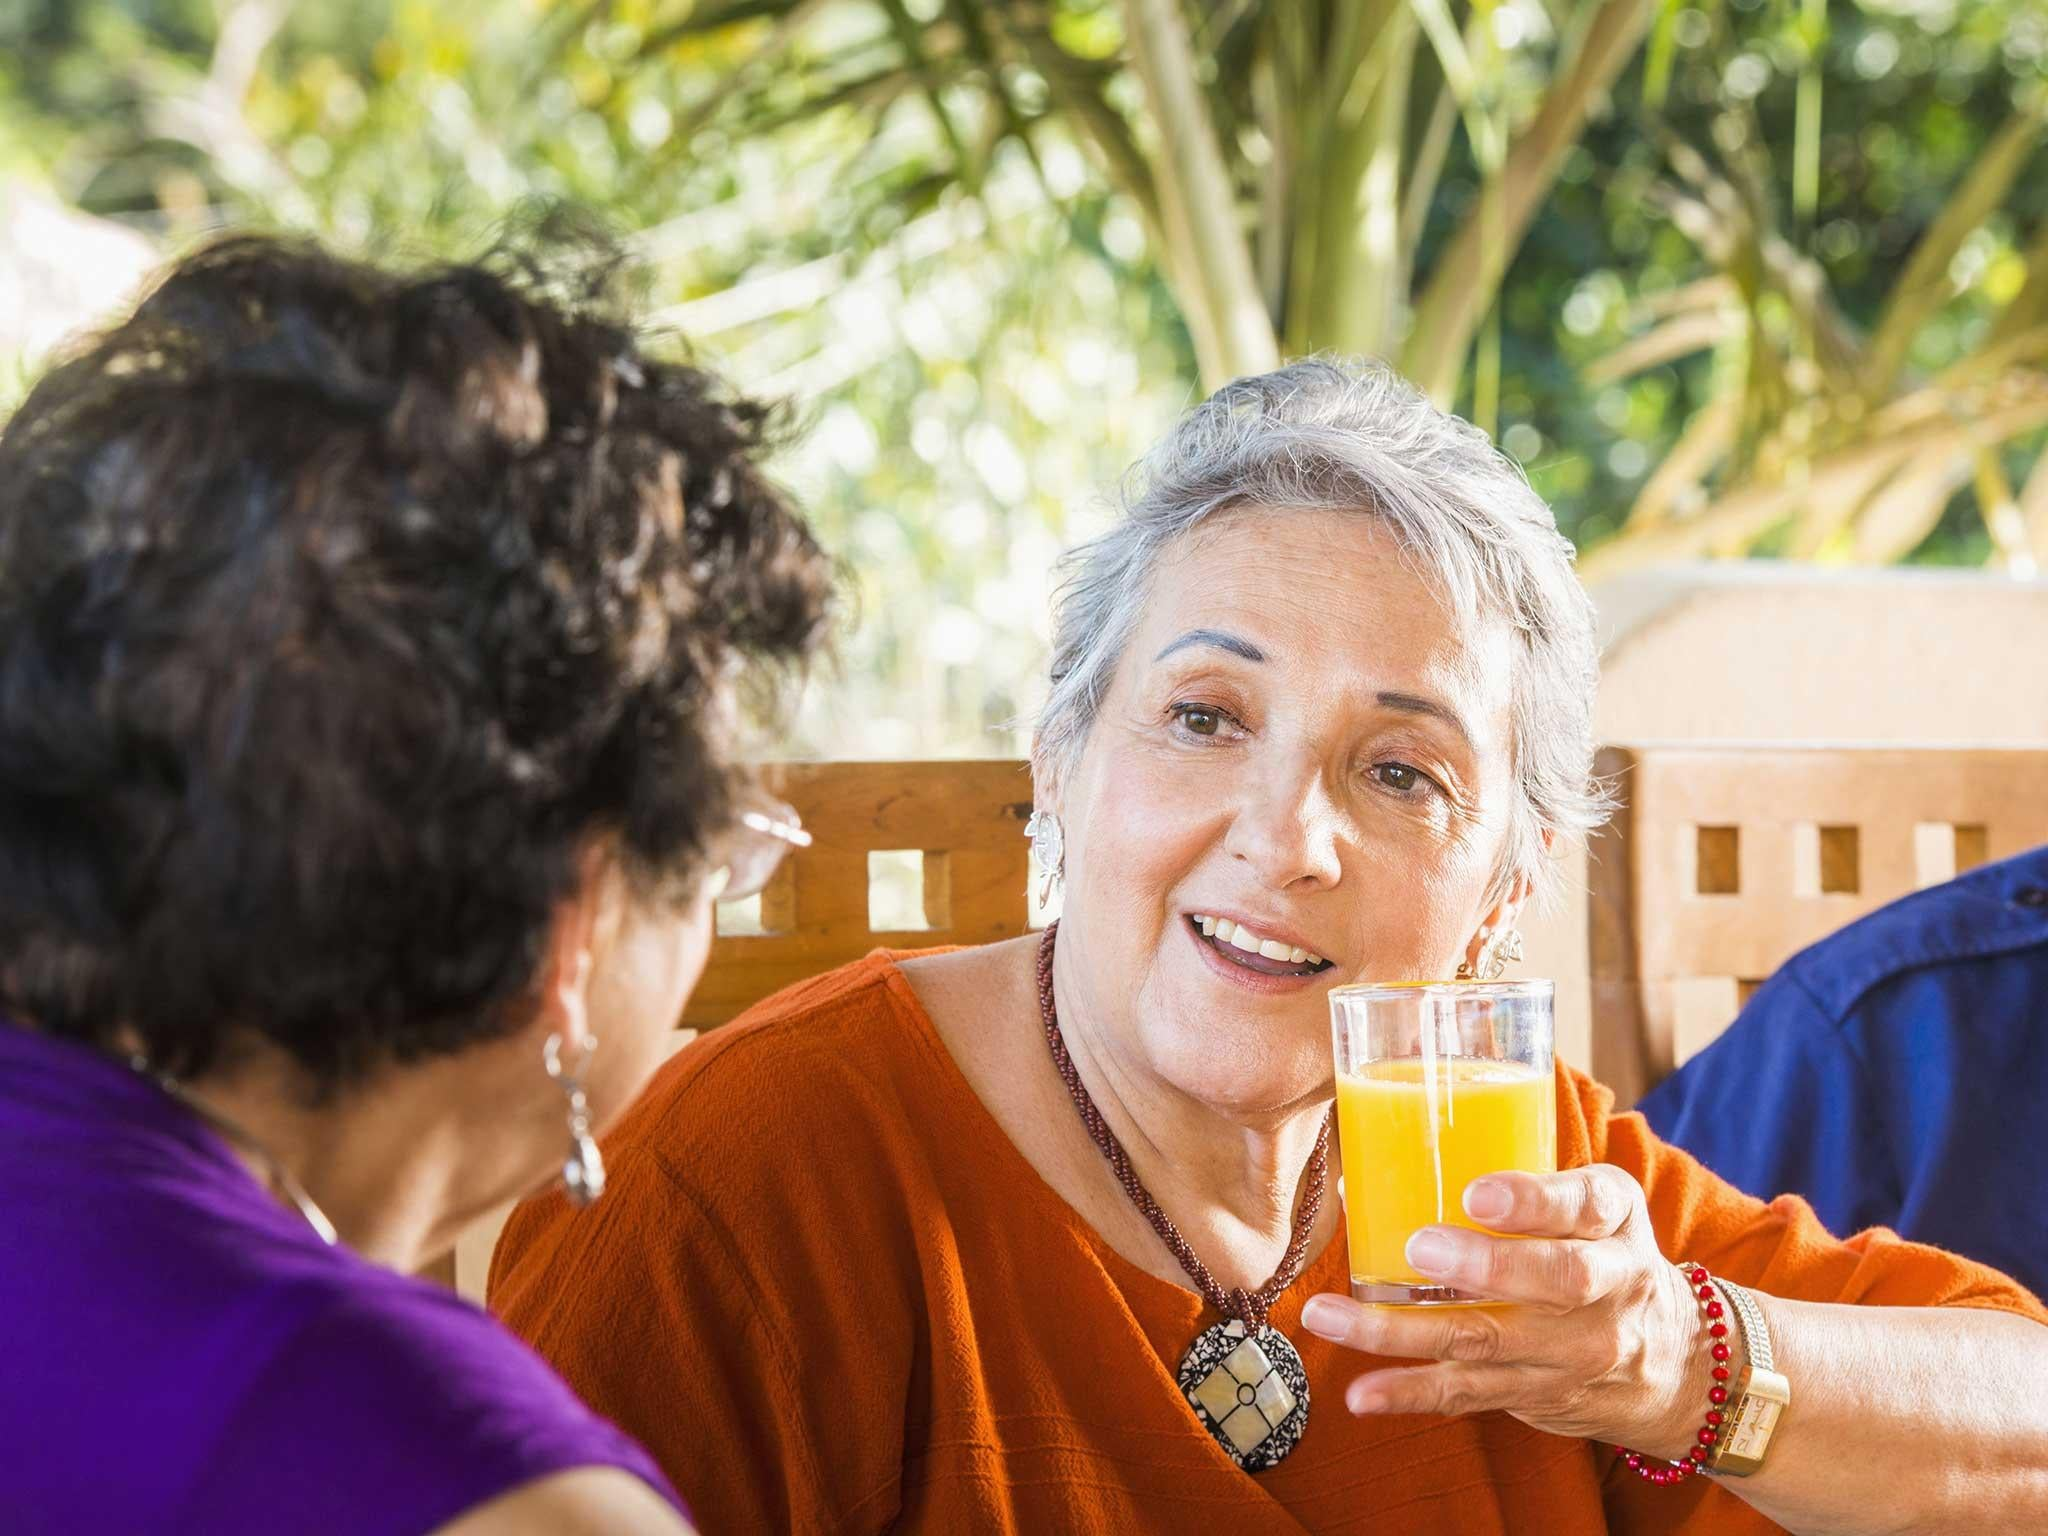 New menopause drugs offer women relief from 'debilitating' hot flushes